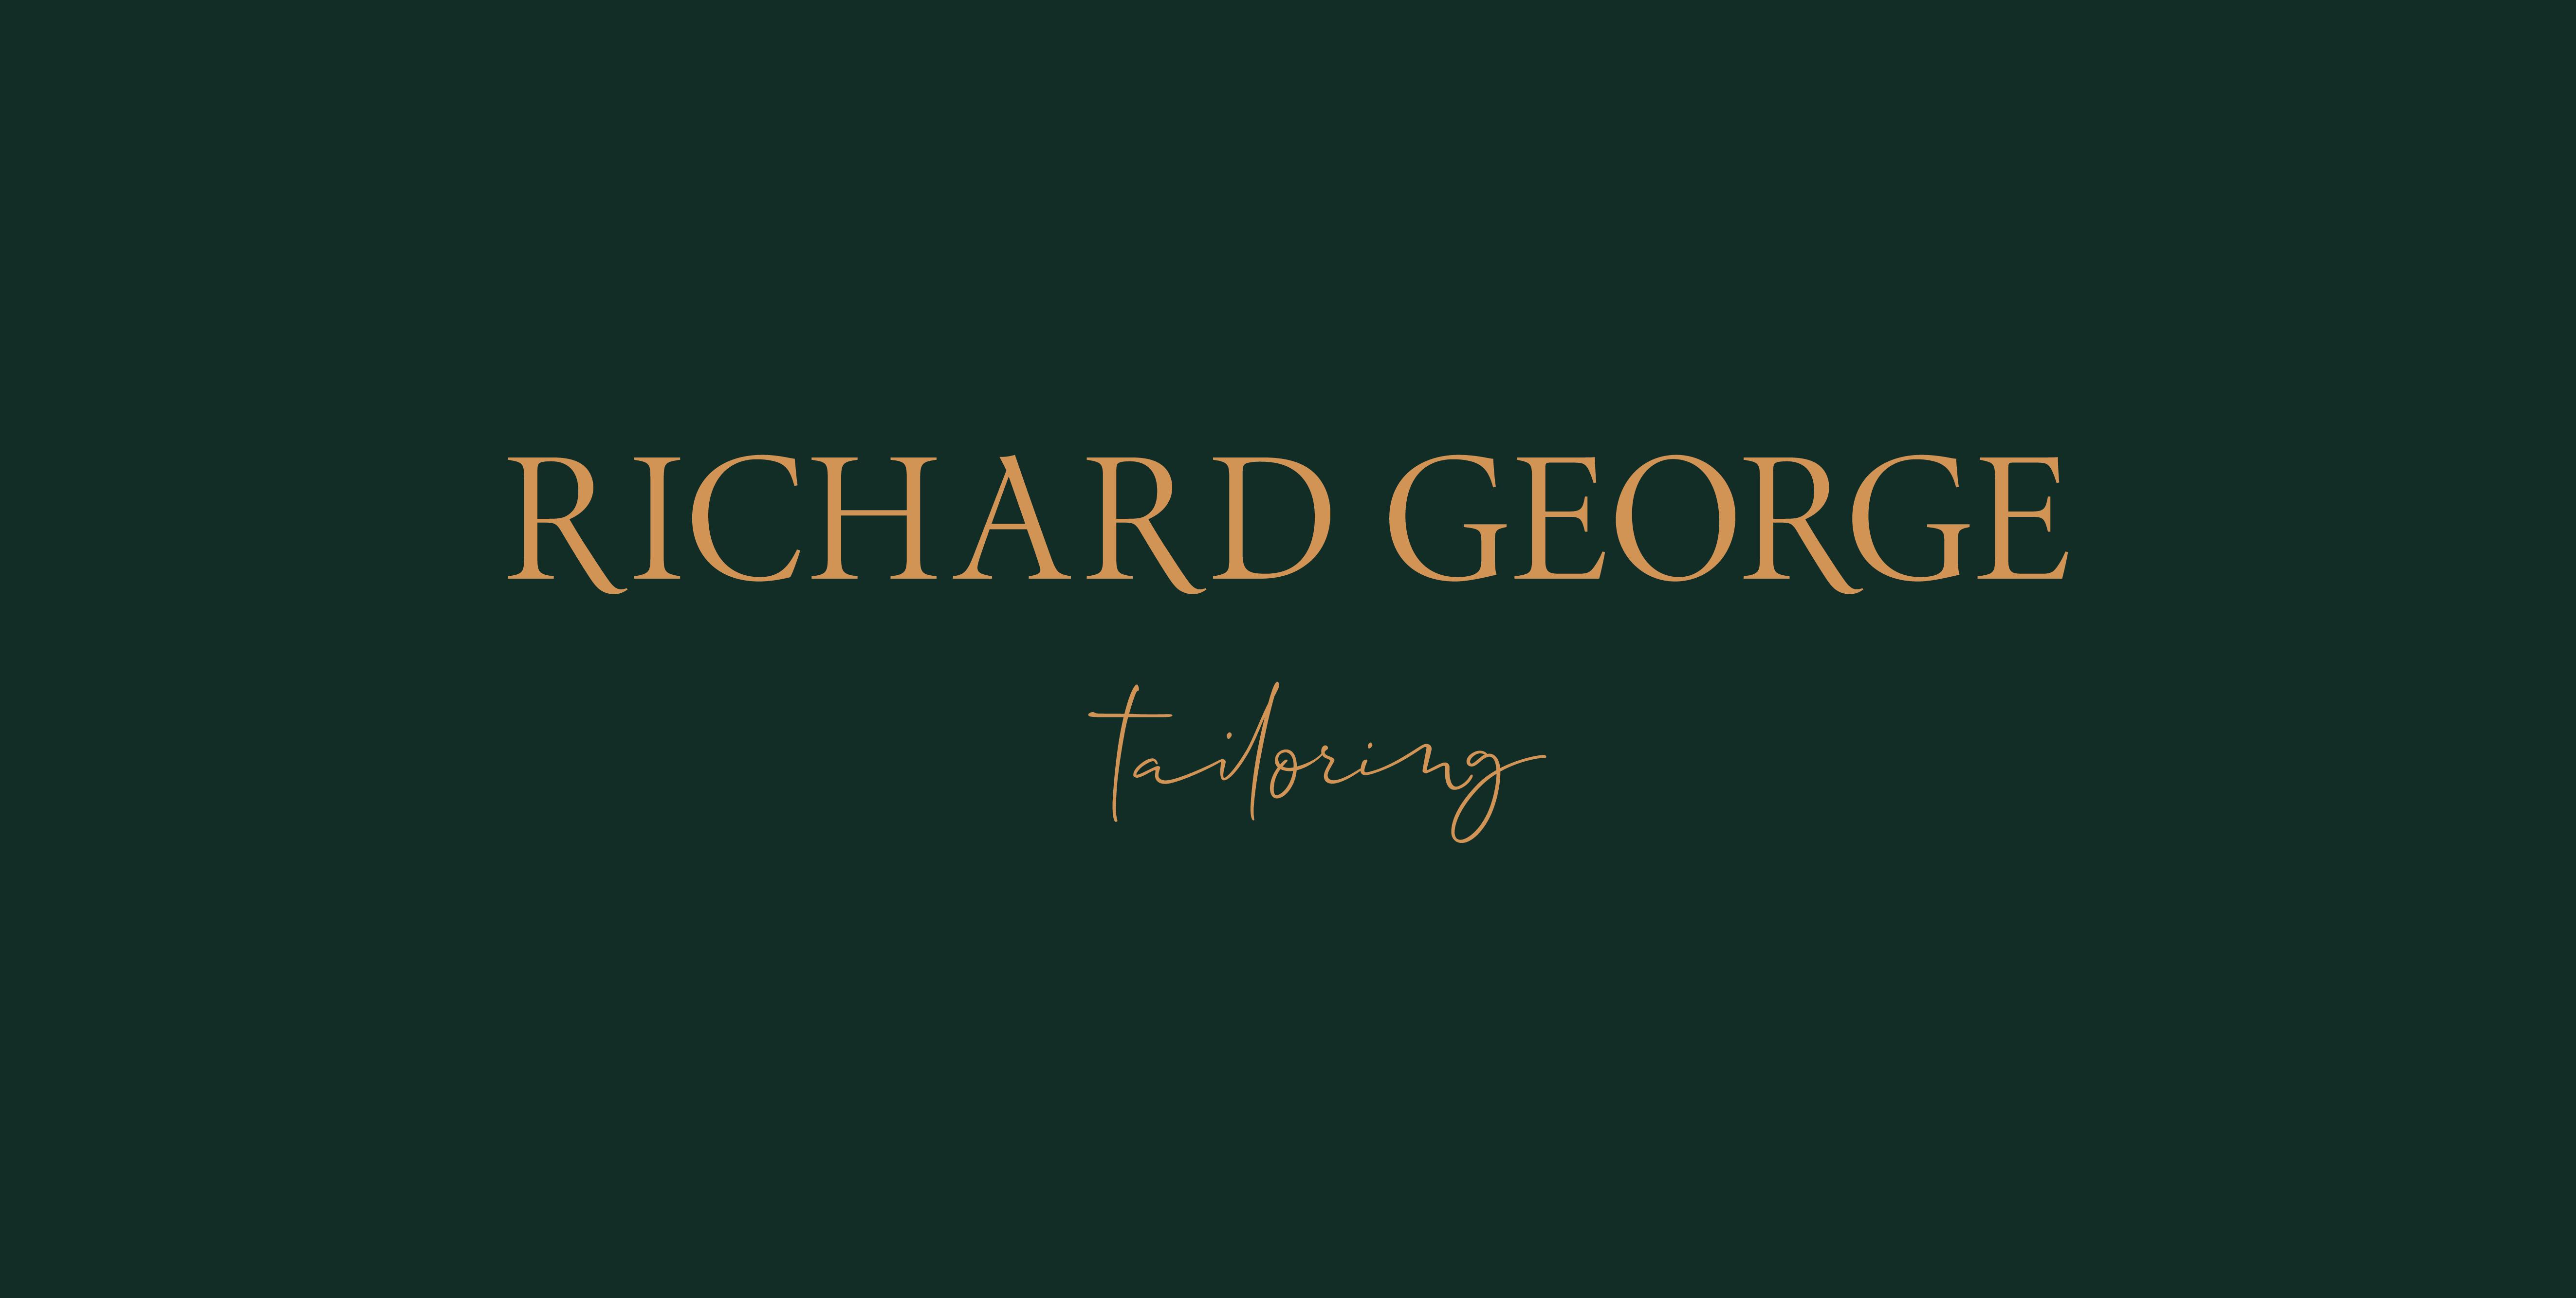 Richard George Brand Development